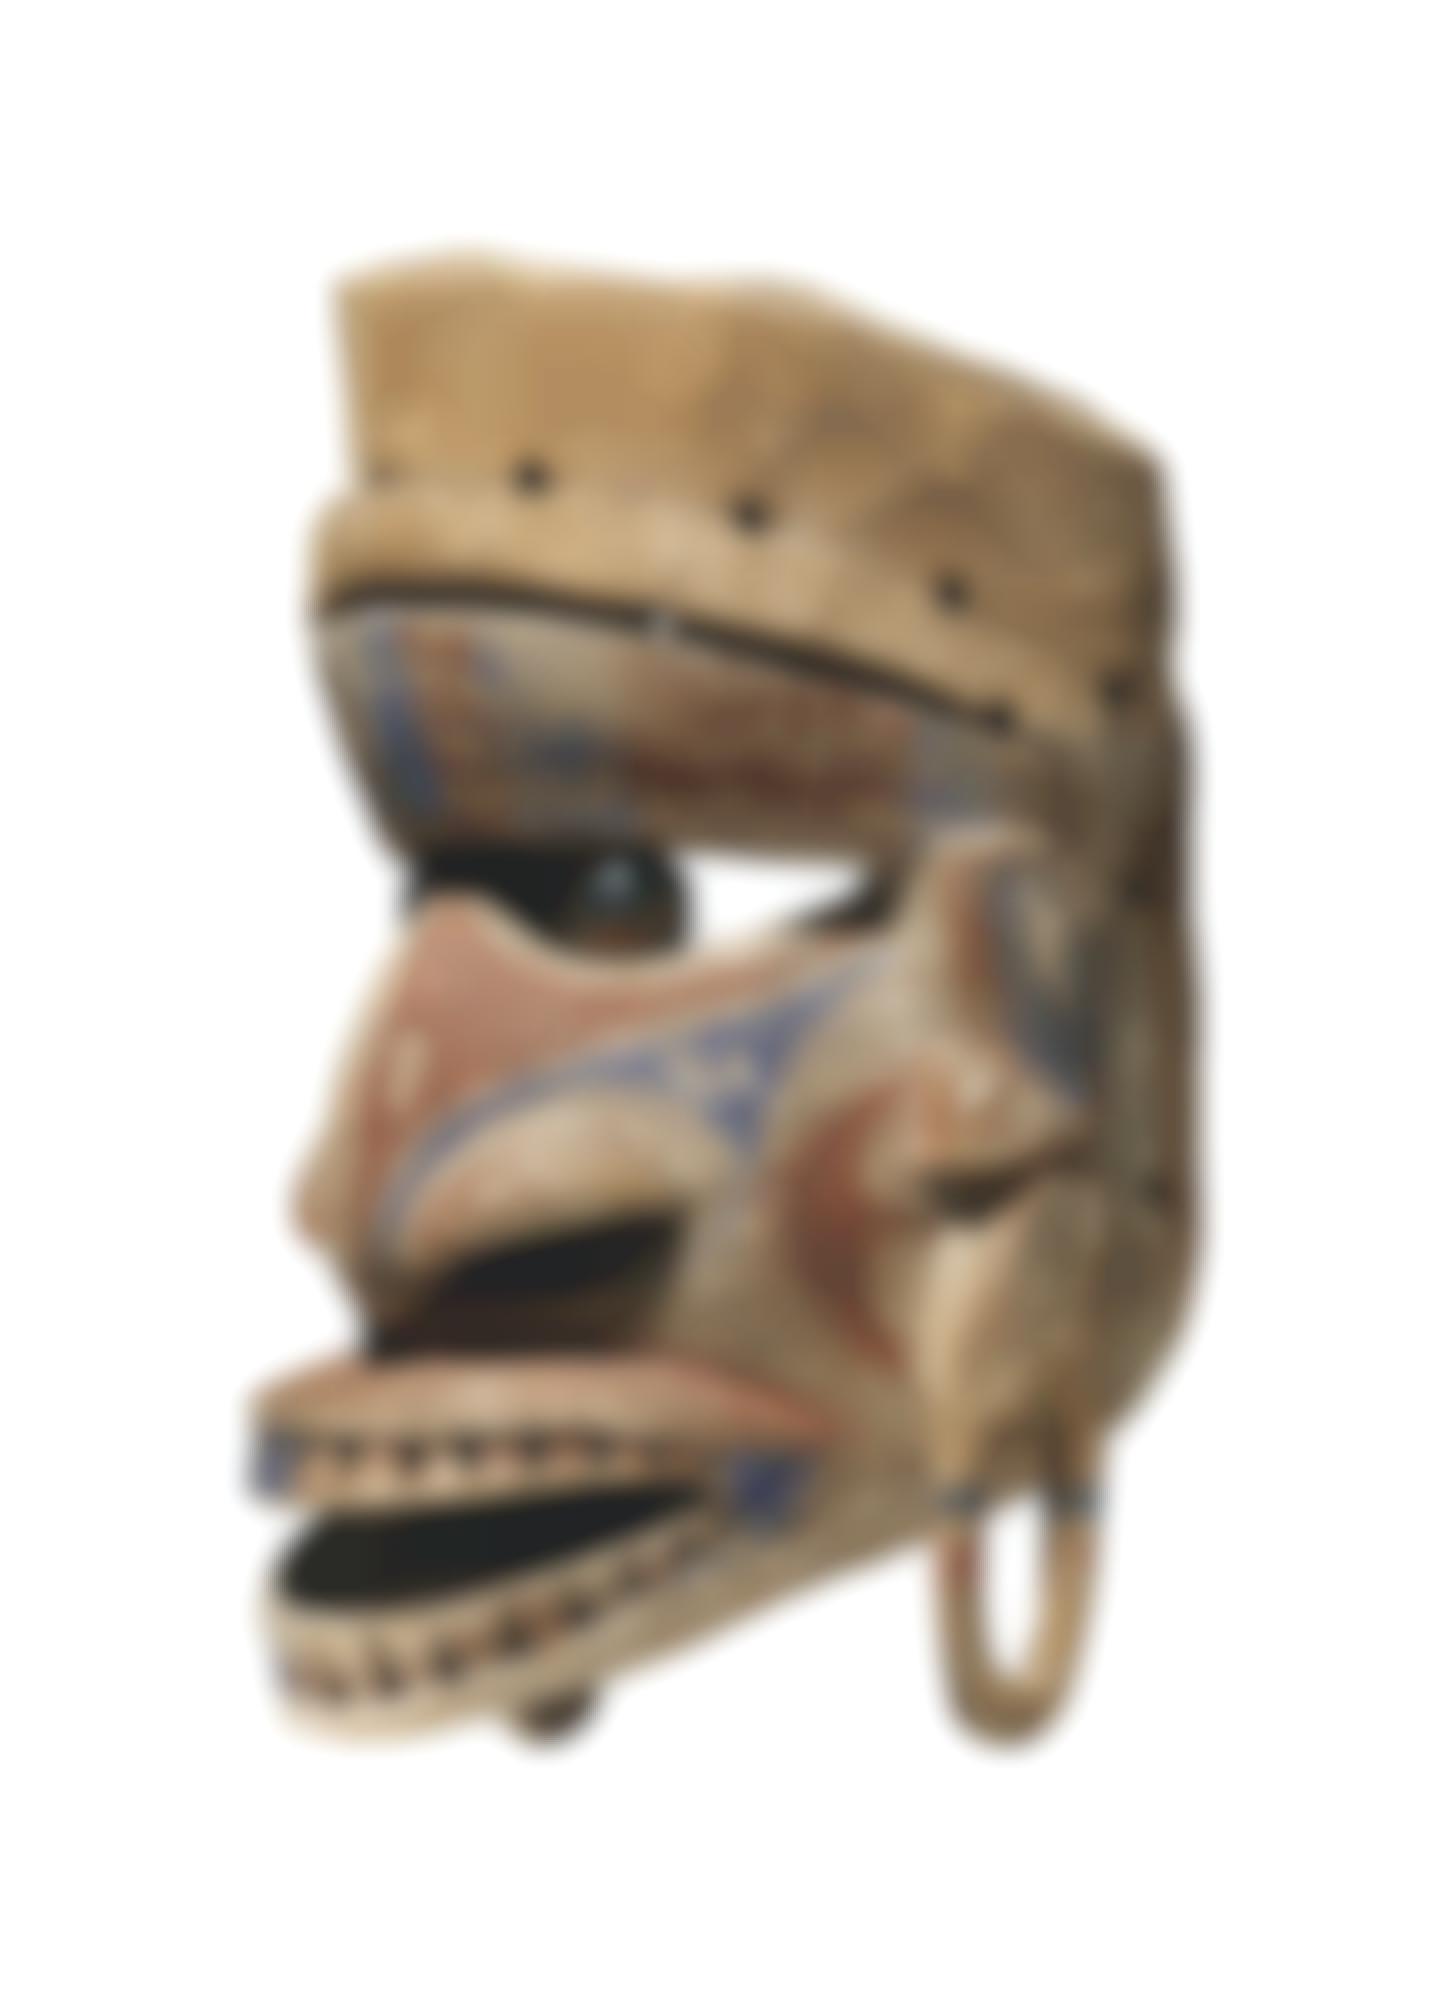 Masque Tatanua, Nouvelle-Irlande, Archipel de Bismark - Tatanua Mask, New Ireland, Bismarck Archipelago-